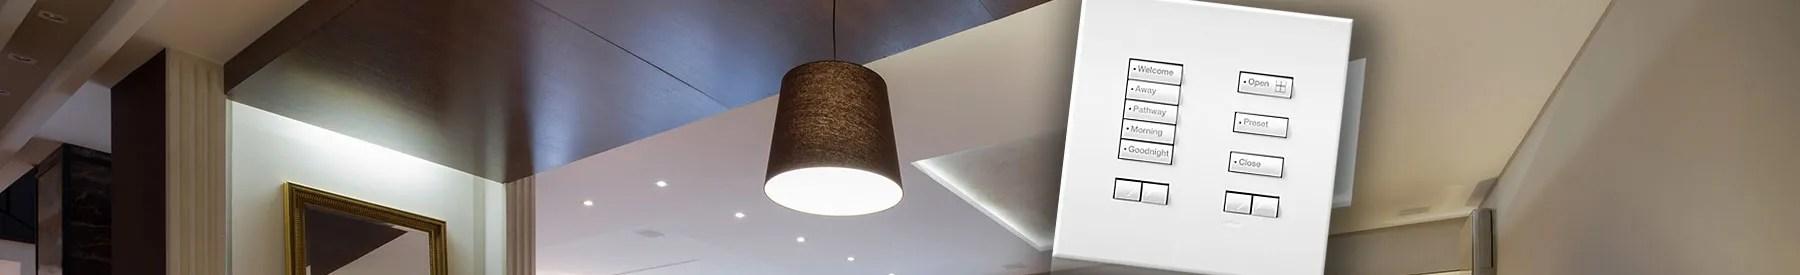 classic stereo intelligent lighting